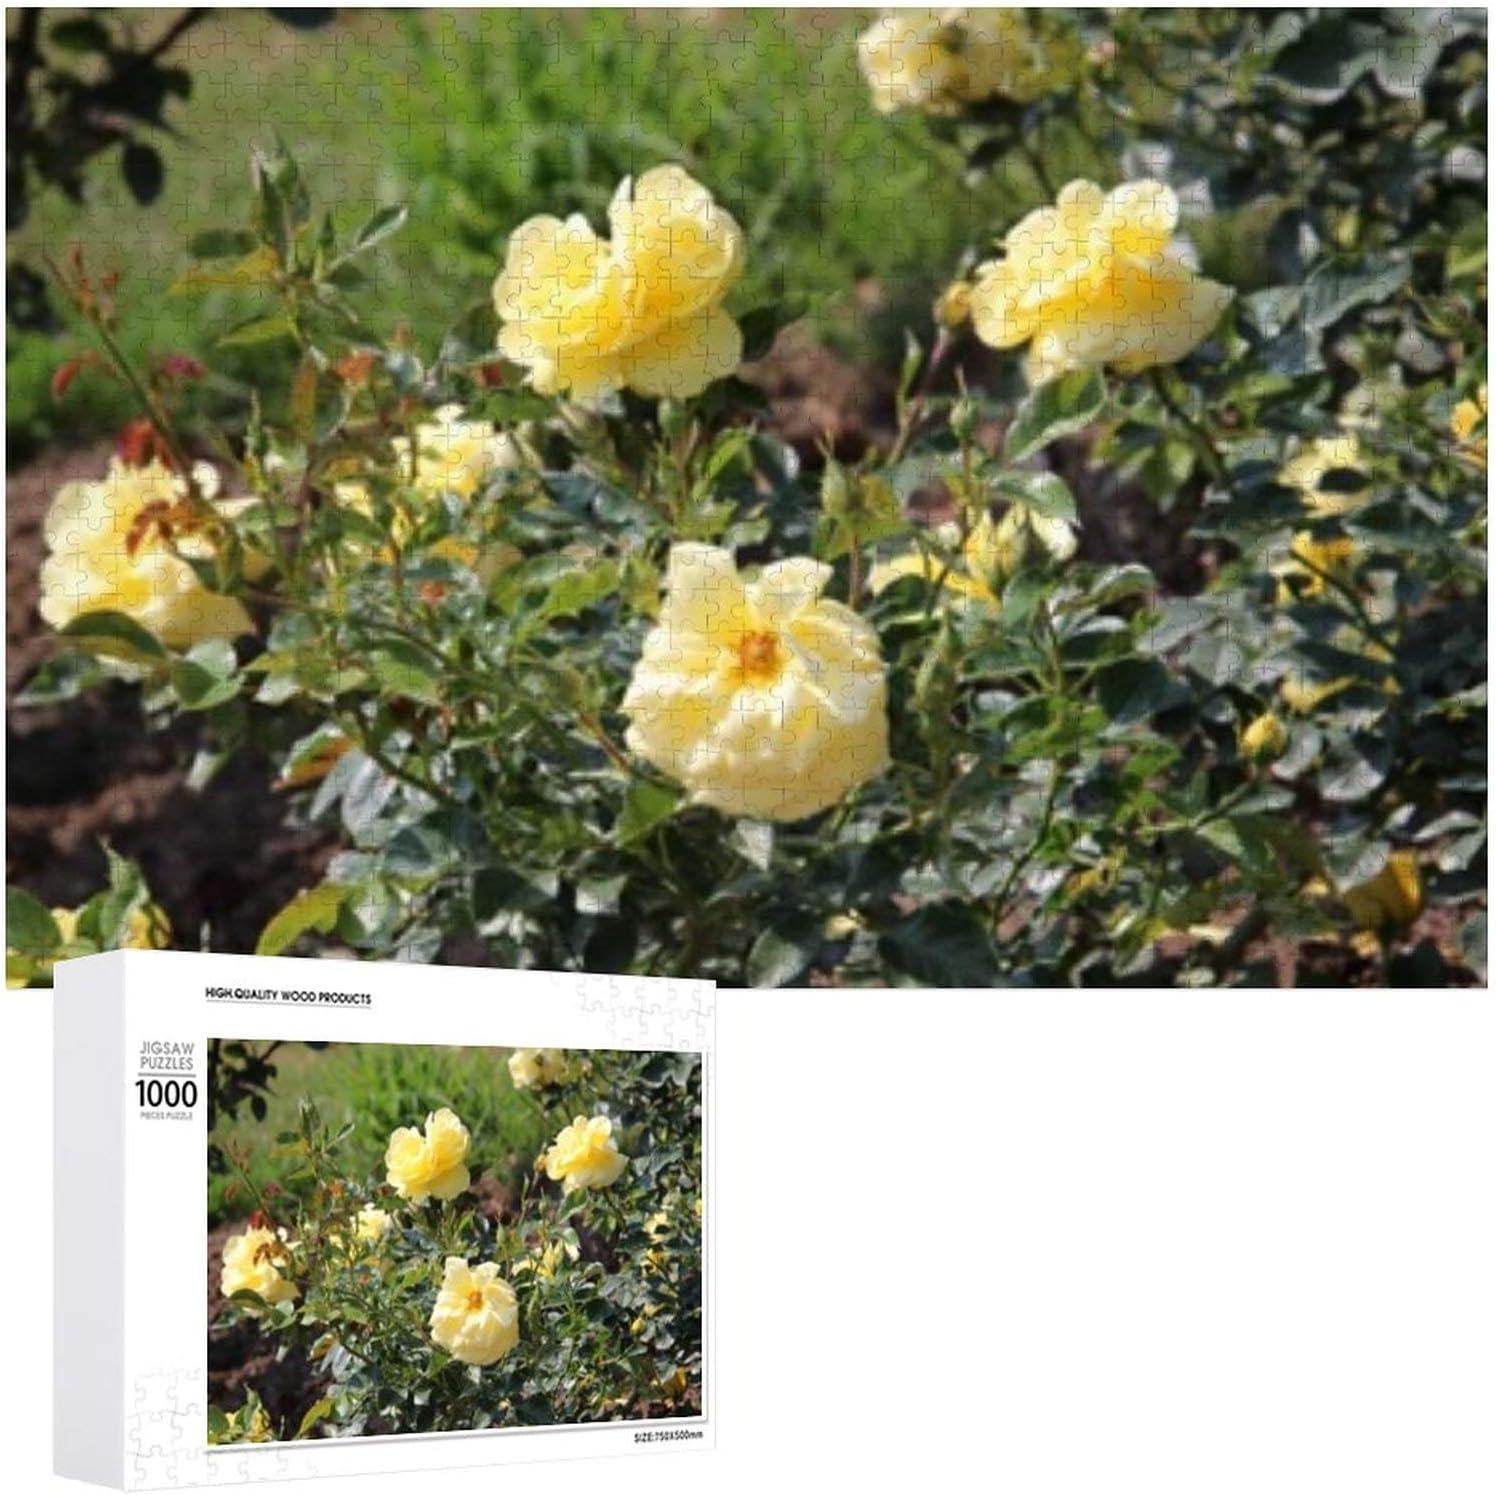 Ranking TOP4 Flowers Garden Hokkaido Japan - 1000 mart Adults Jigsaw Puzzles for